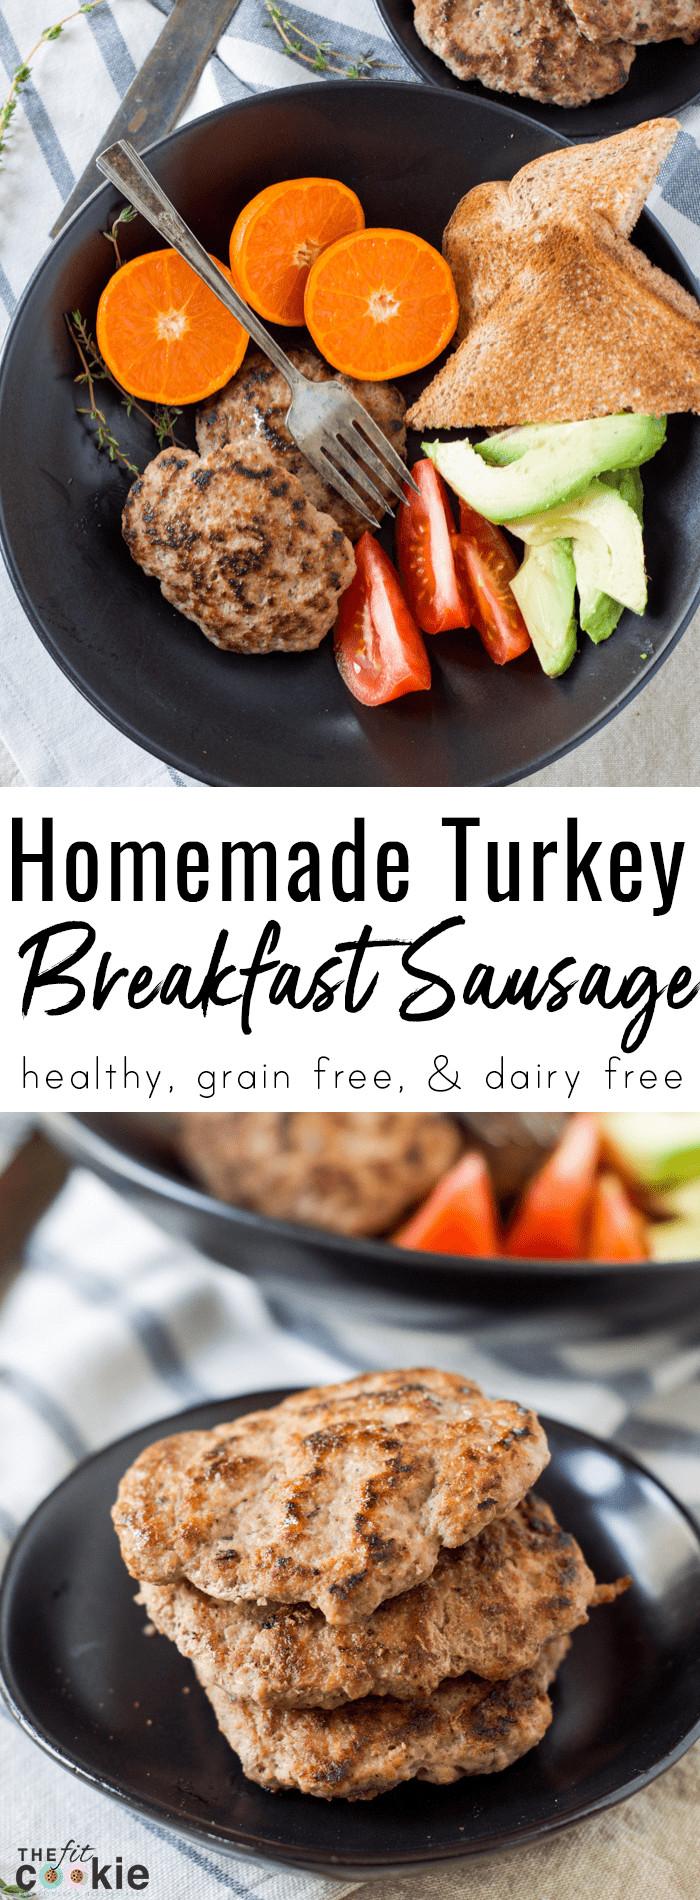 Healthy Breakfast Sausage  Healthy Homemade Turkey Breakfast Sausage Paleo • The